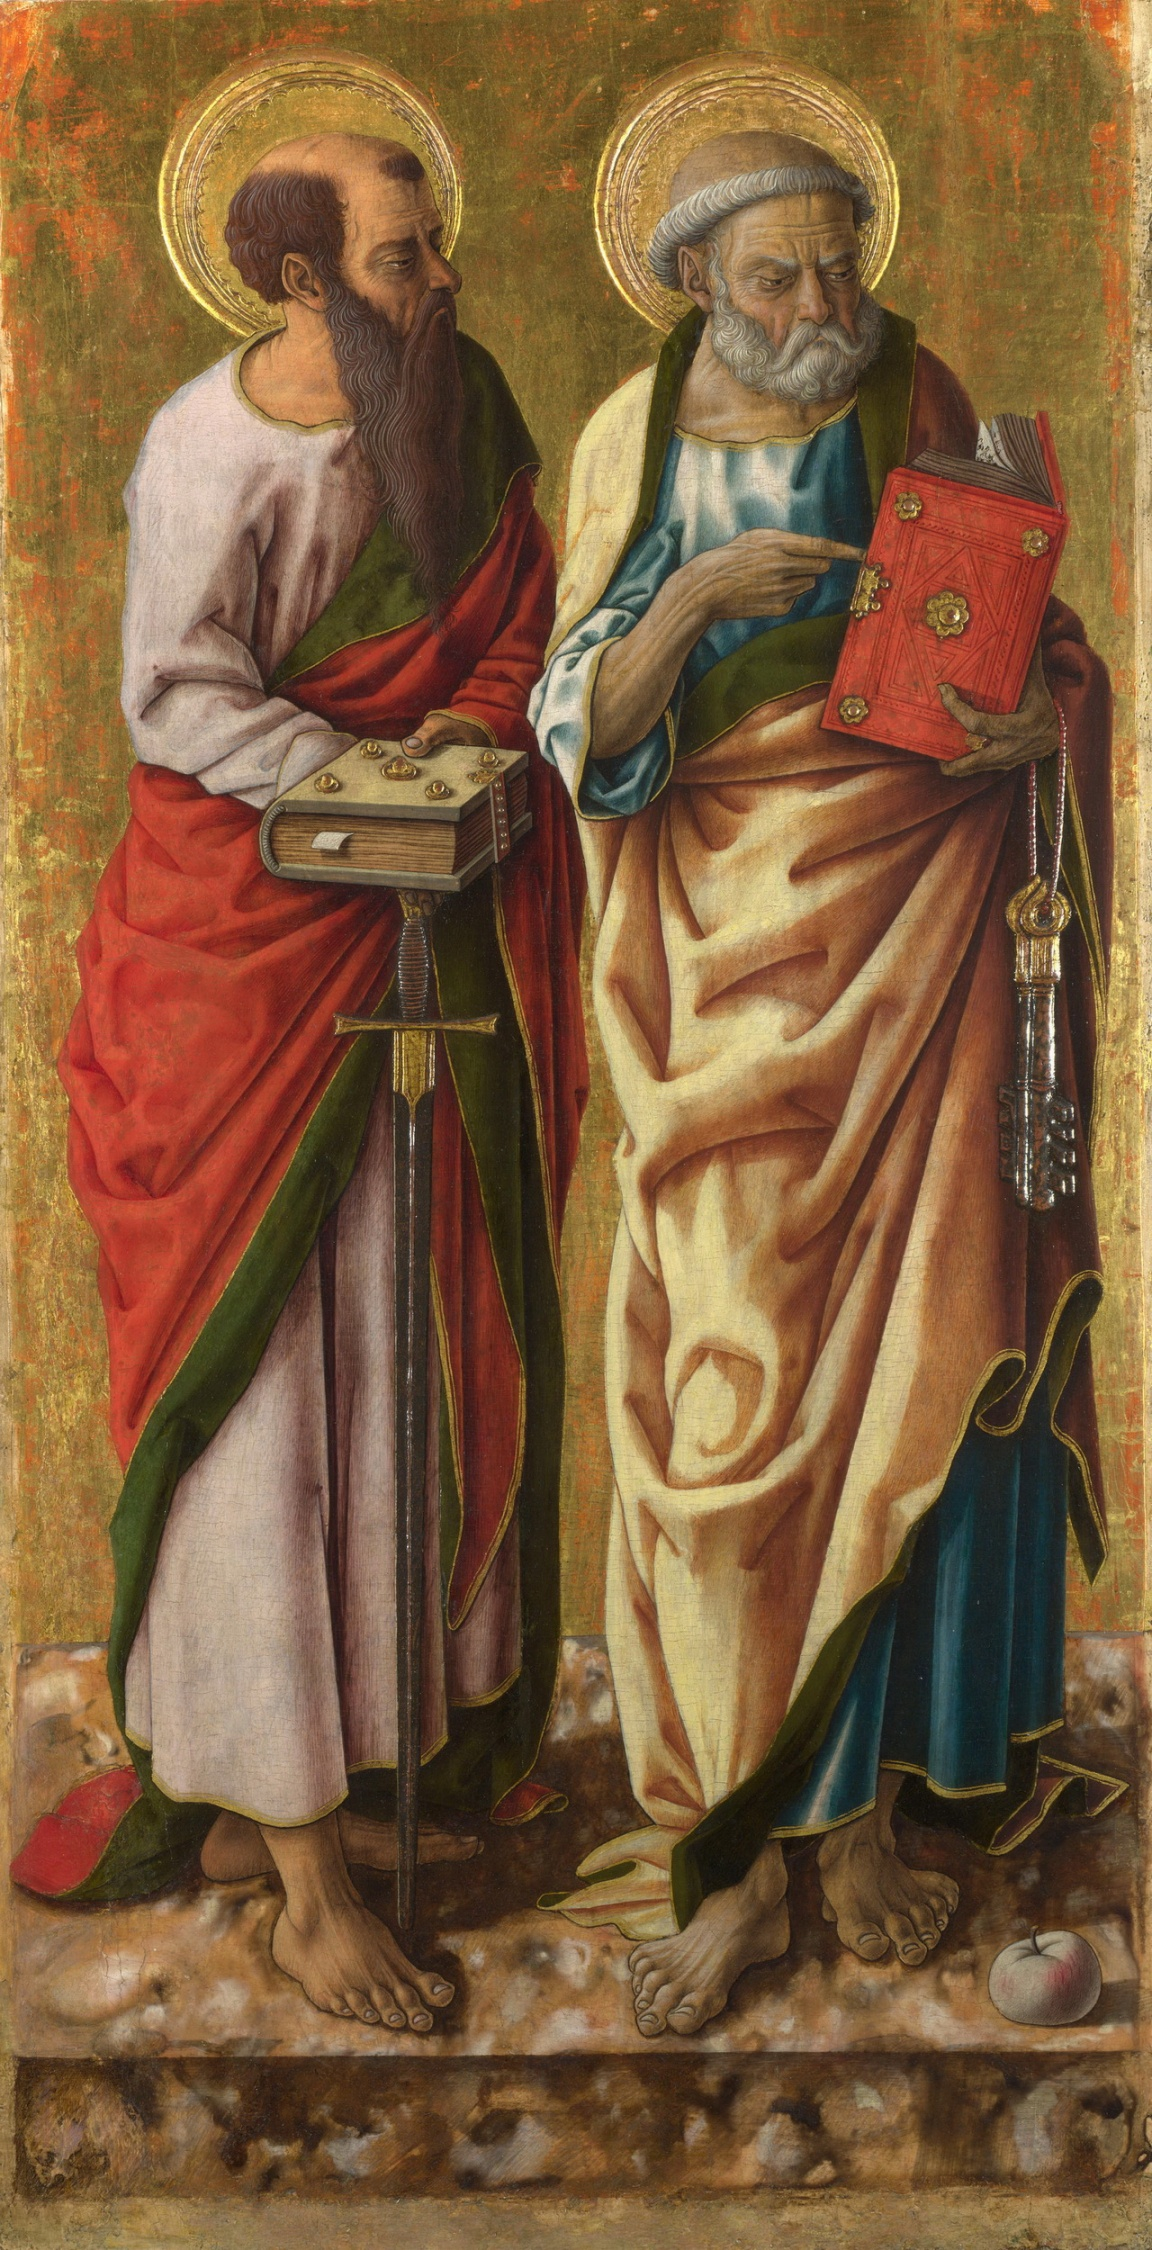 Карло Кривелли Апостолы Петр и Павел 2.jpg